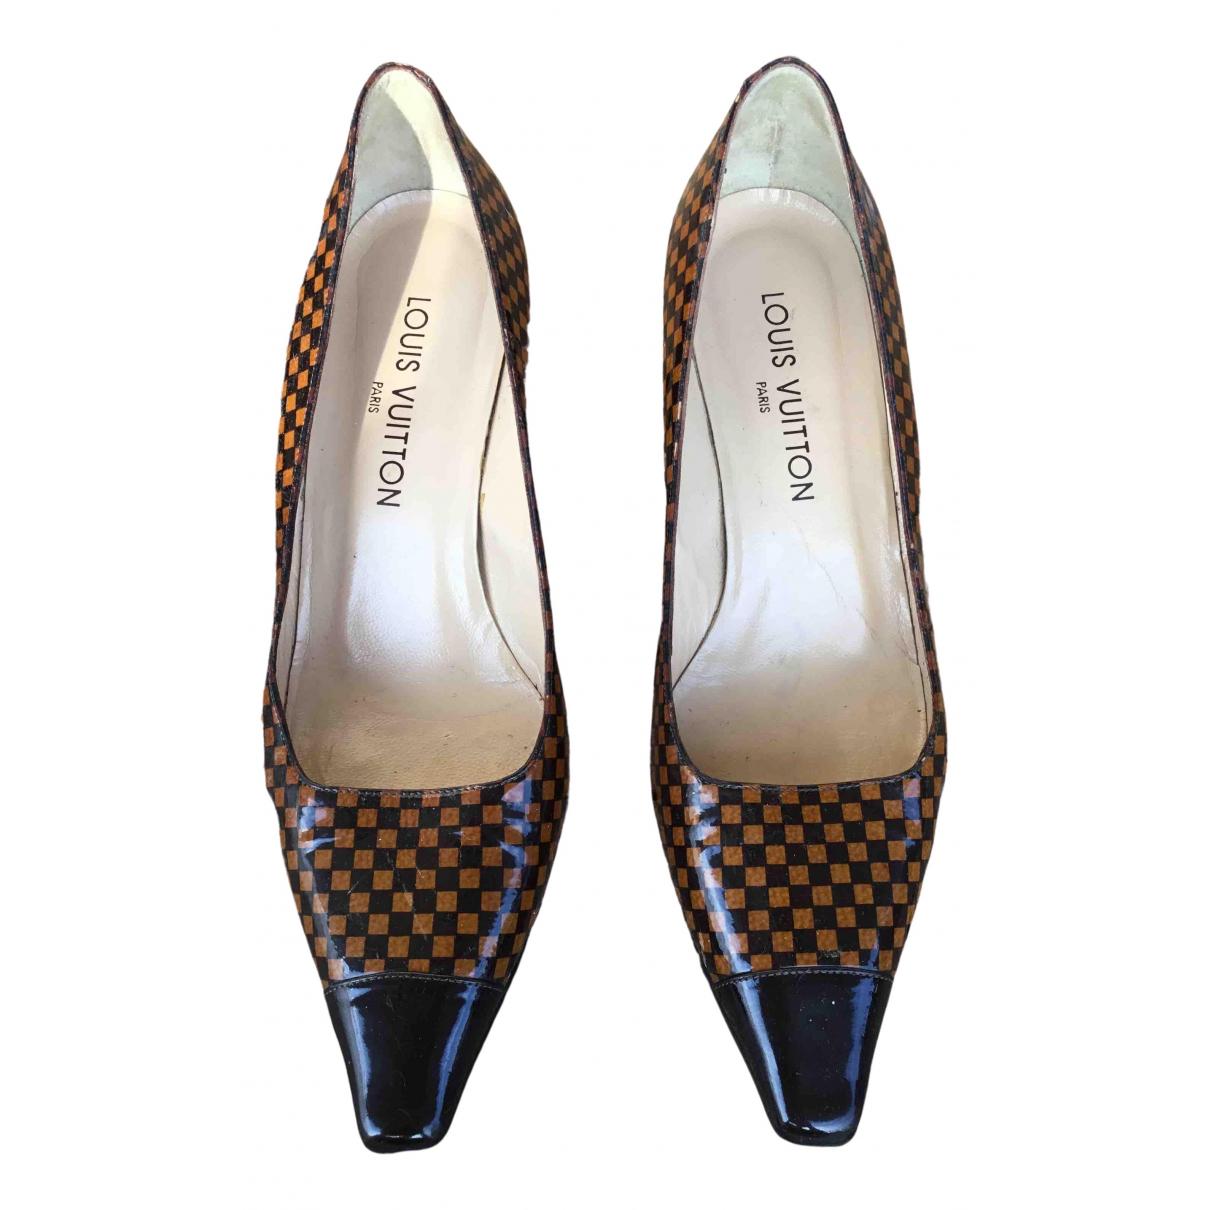 Louis Vuitton N Brown Cloth Heels for Women 38.5 EU